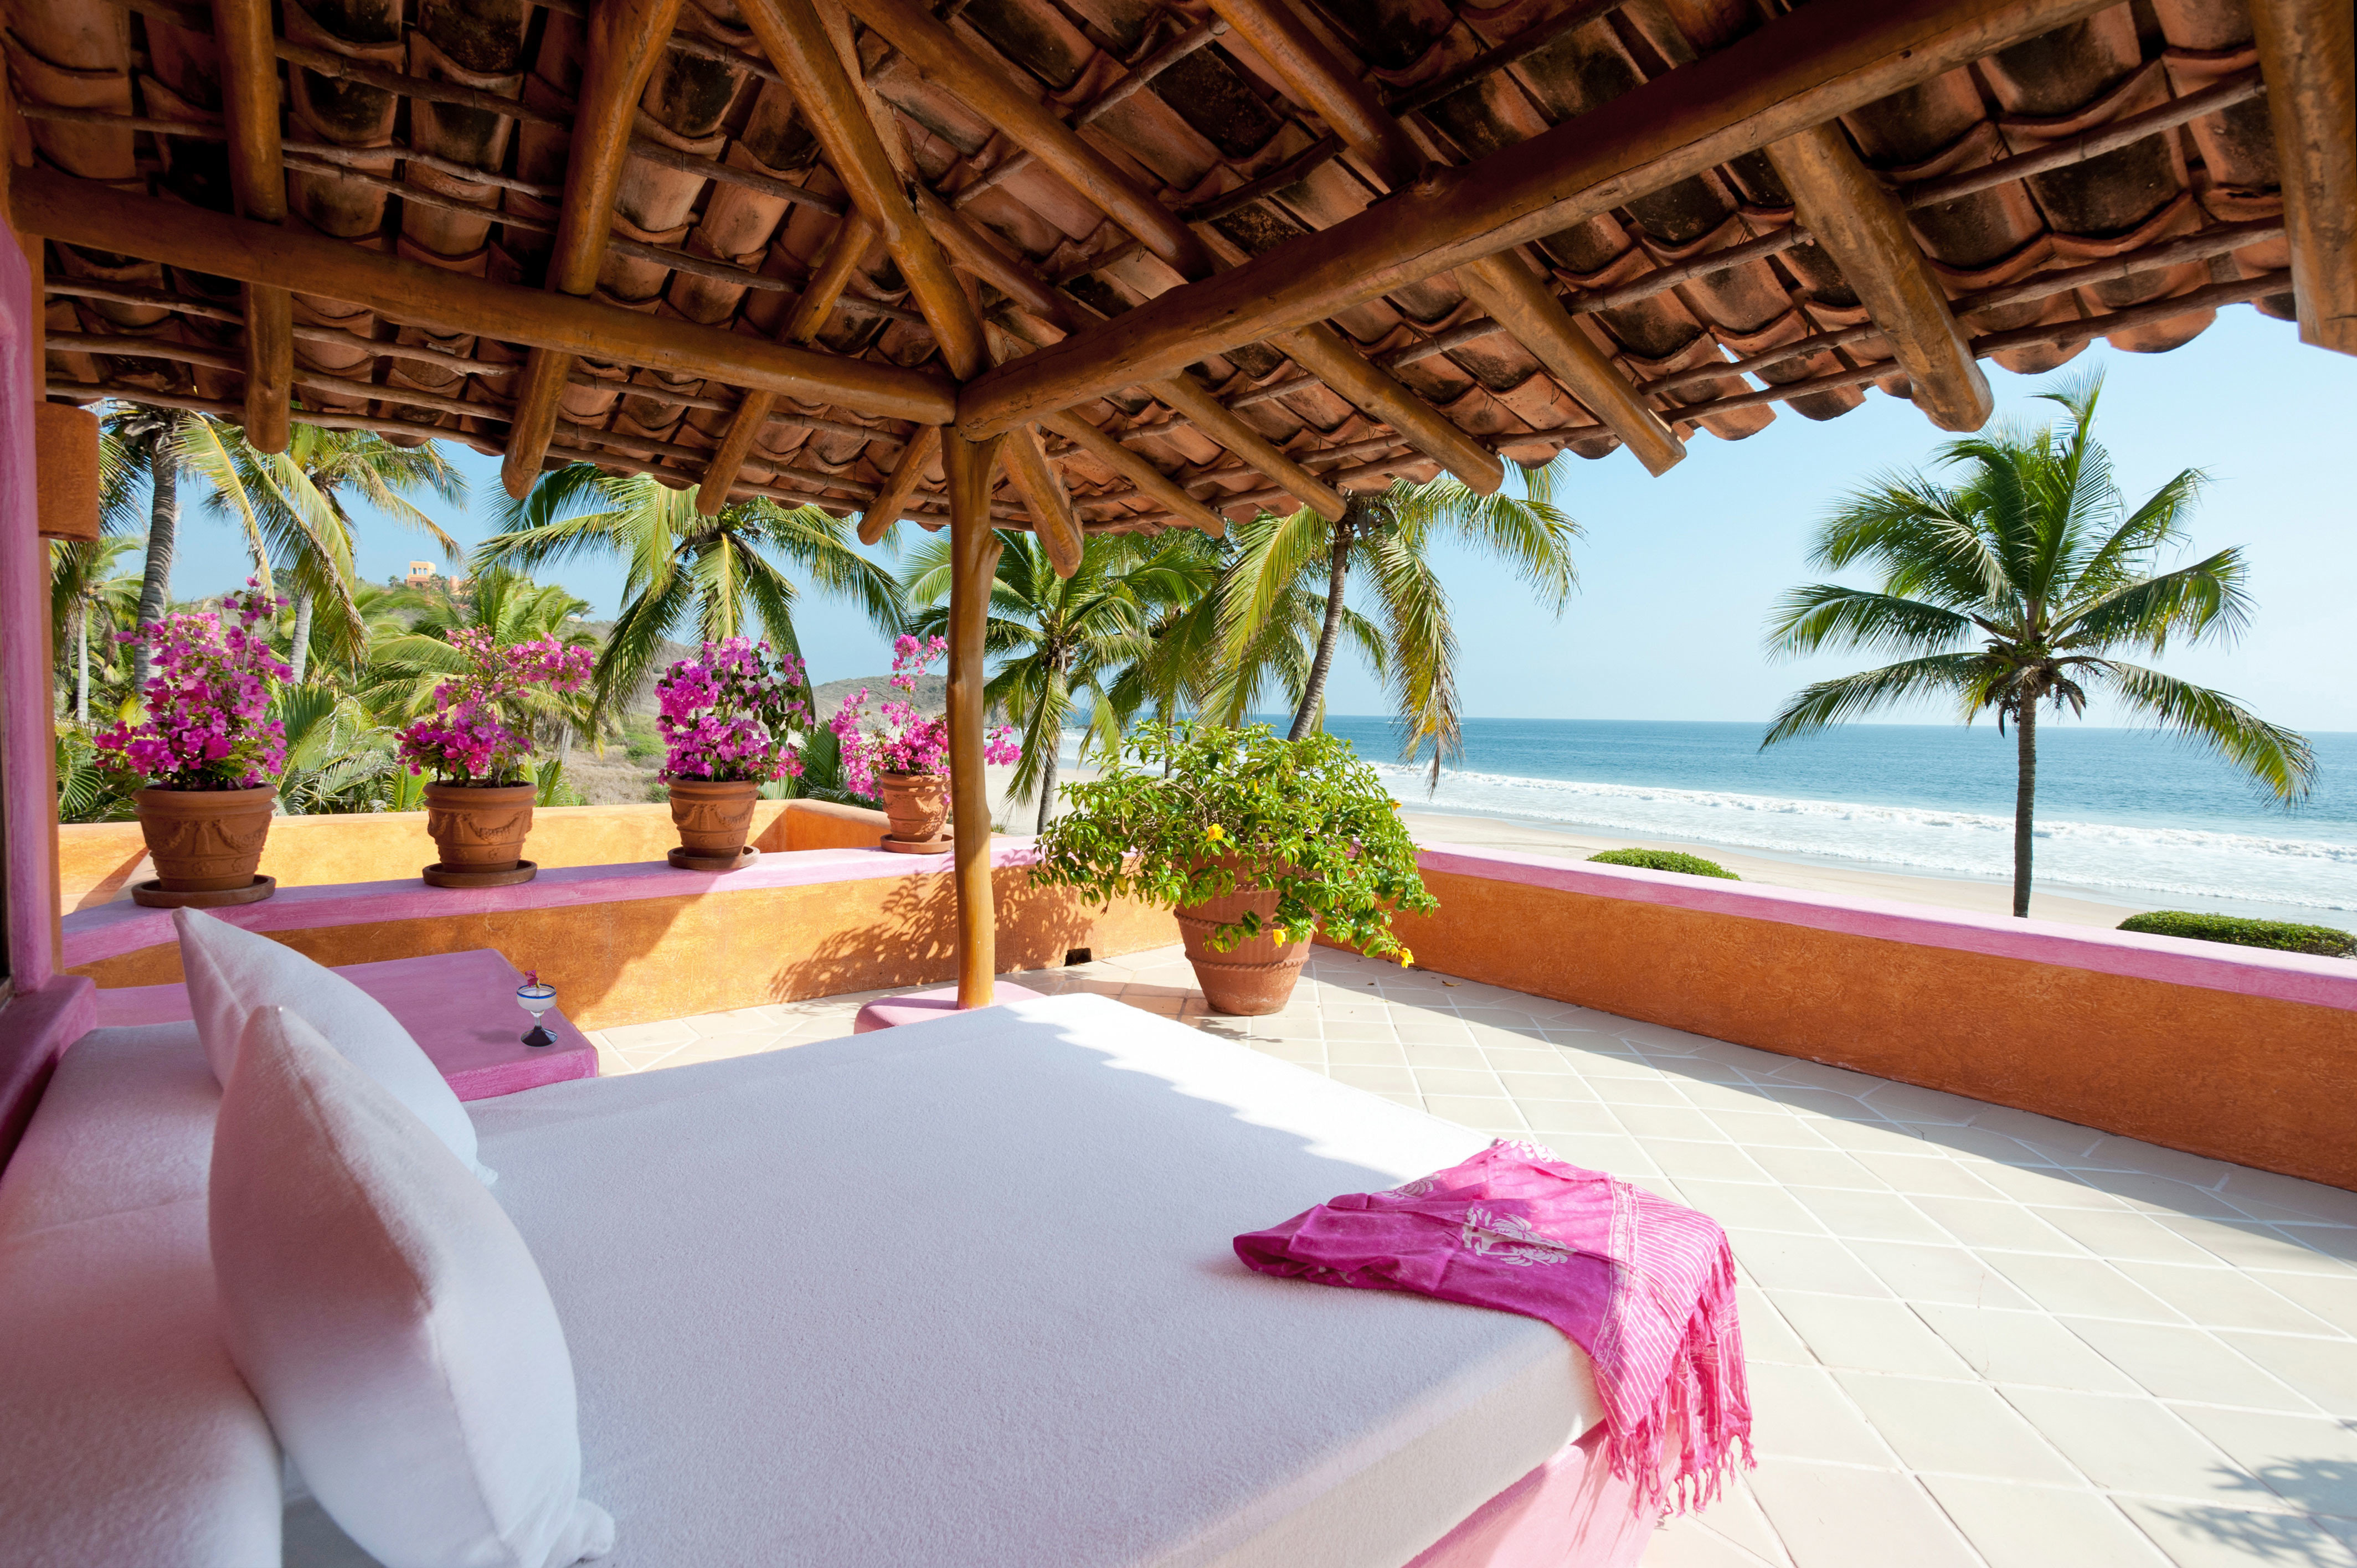 Beachfront Romantic Scenic views property Resort swimming pool Villa hacienda mansion caribbean eco hotel